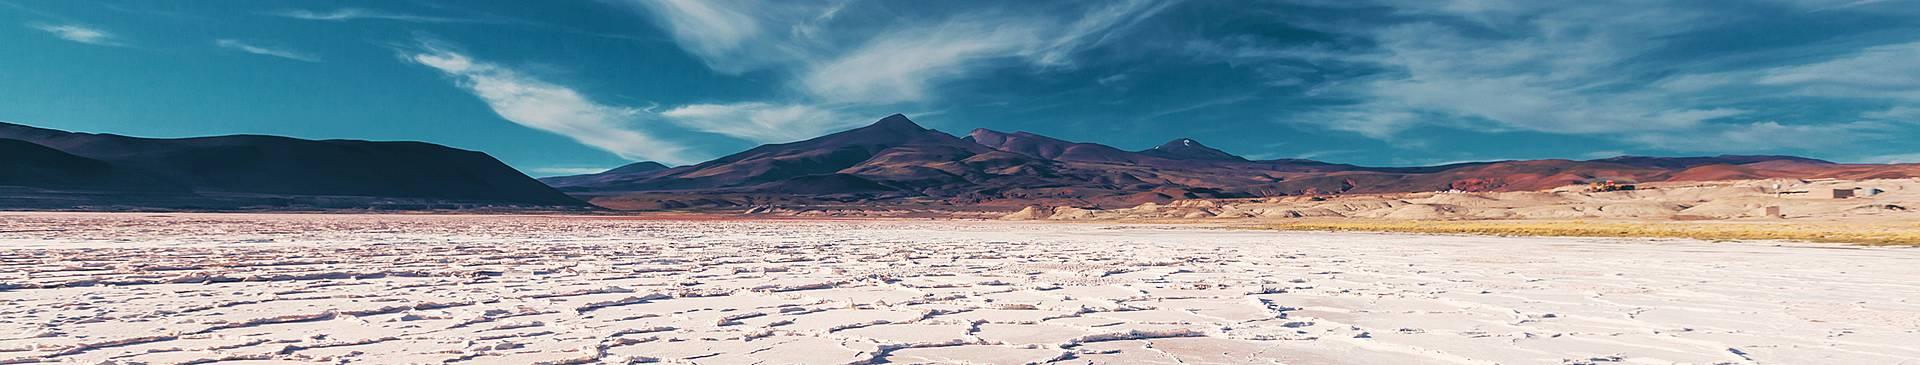 Desert tours in Argentina